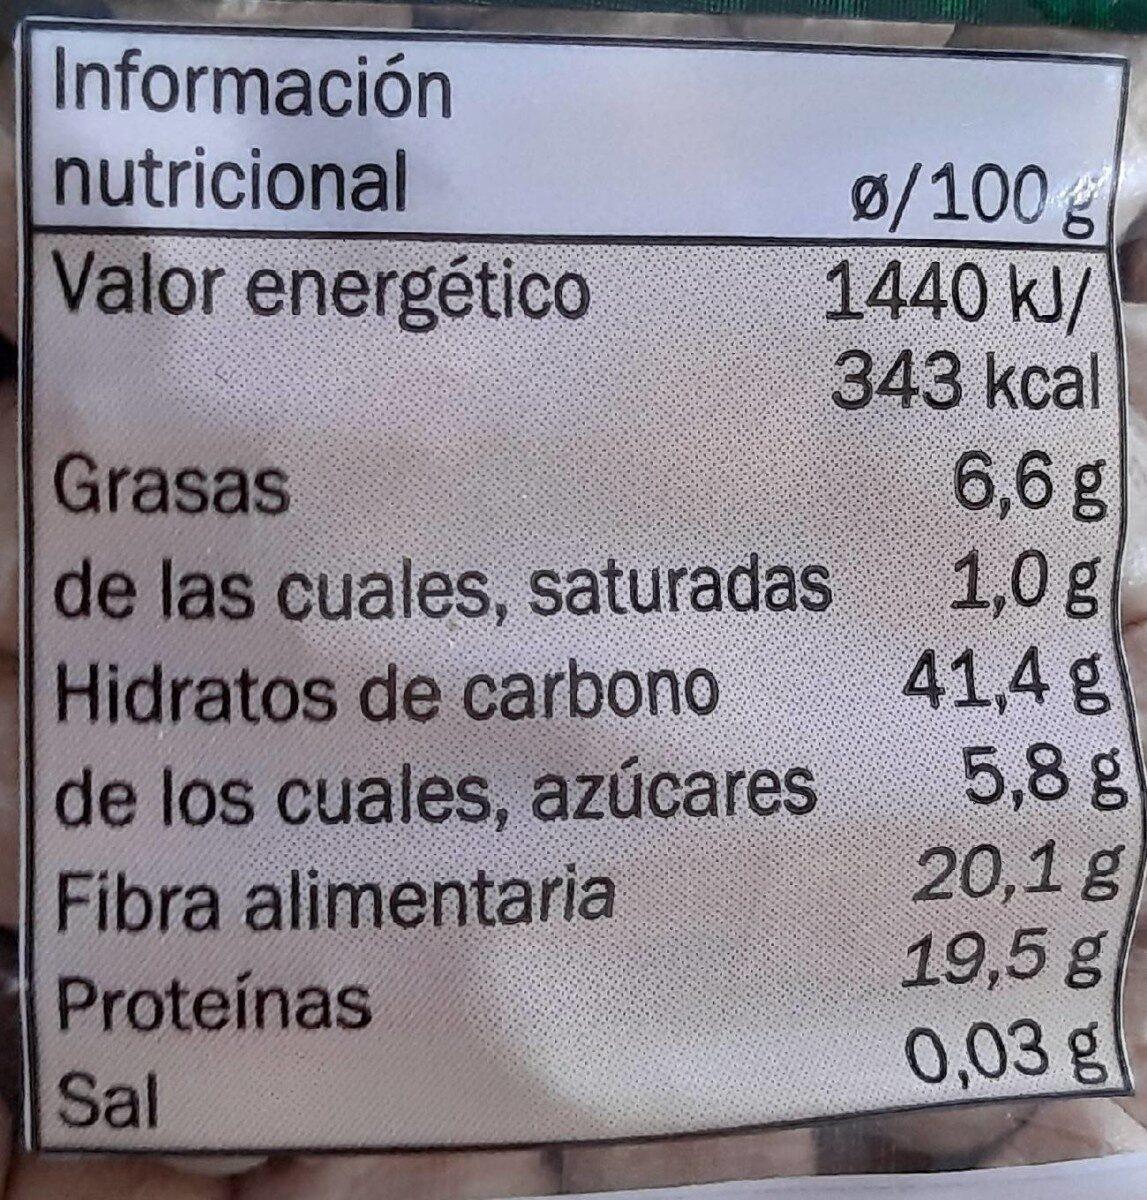 Garbanzos categoría extra - Información nutricional